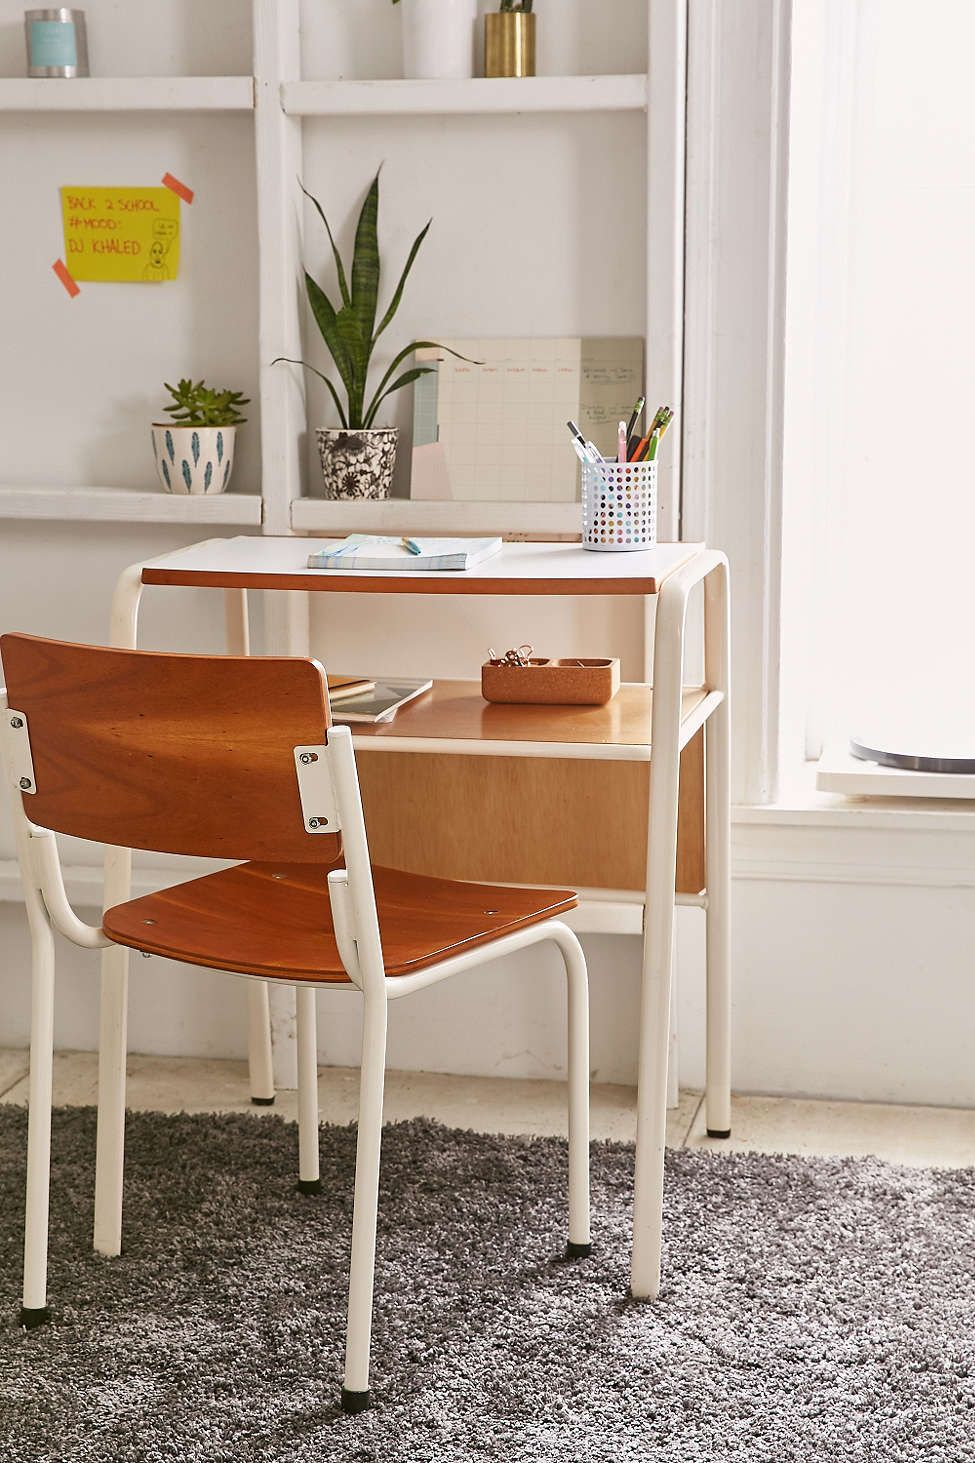 Favi Desk Chair Set Desk And Chair Set Home Office Furniture Pvc Furniture Plans